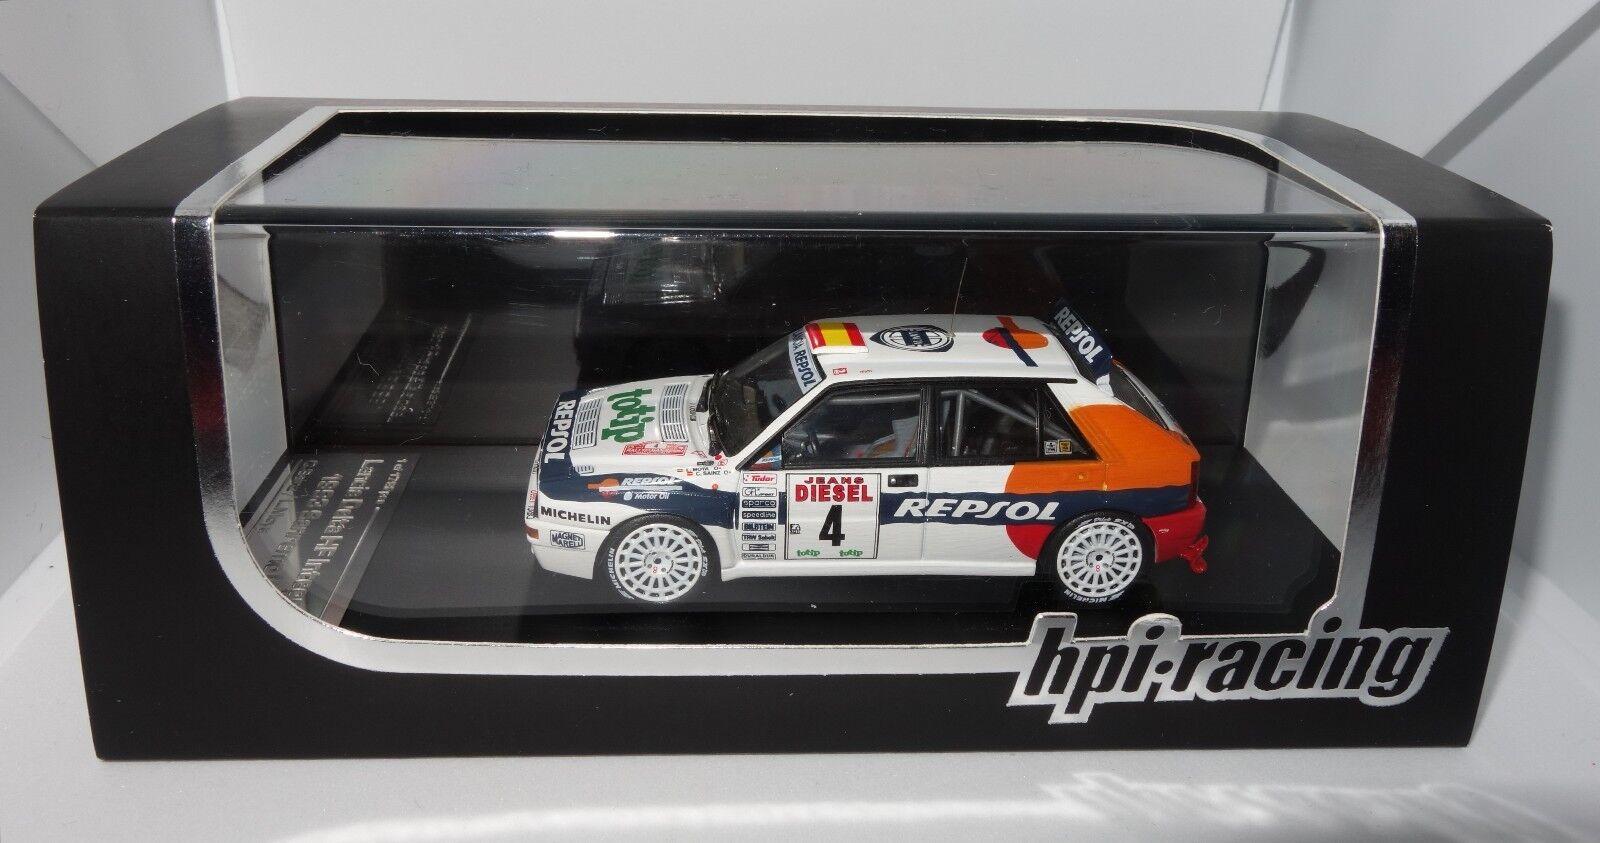 HPI 976 1 43 Lancia Delta HF Integrale Rallye Sanremo 1993 Sainz RARE